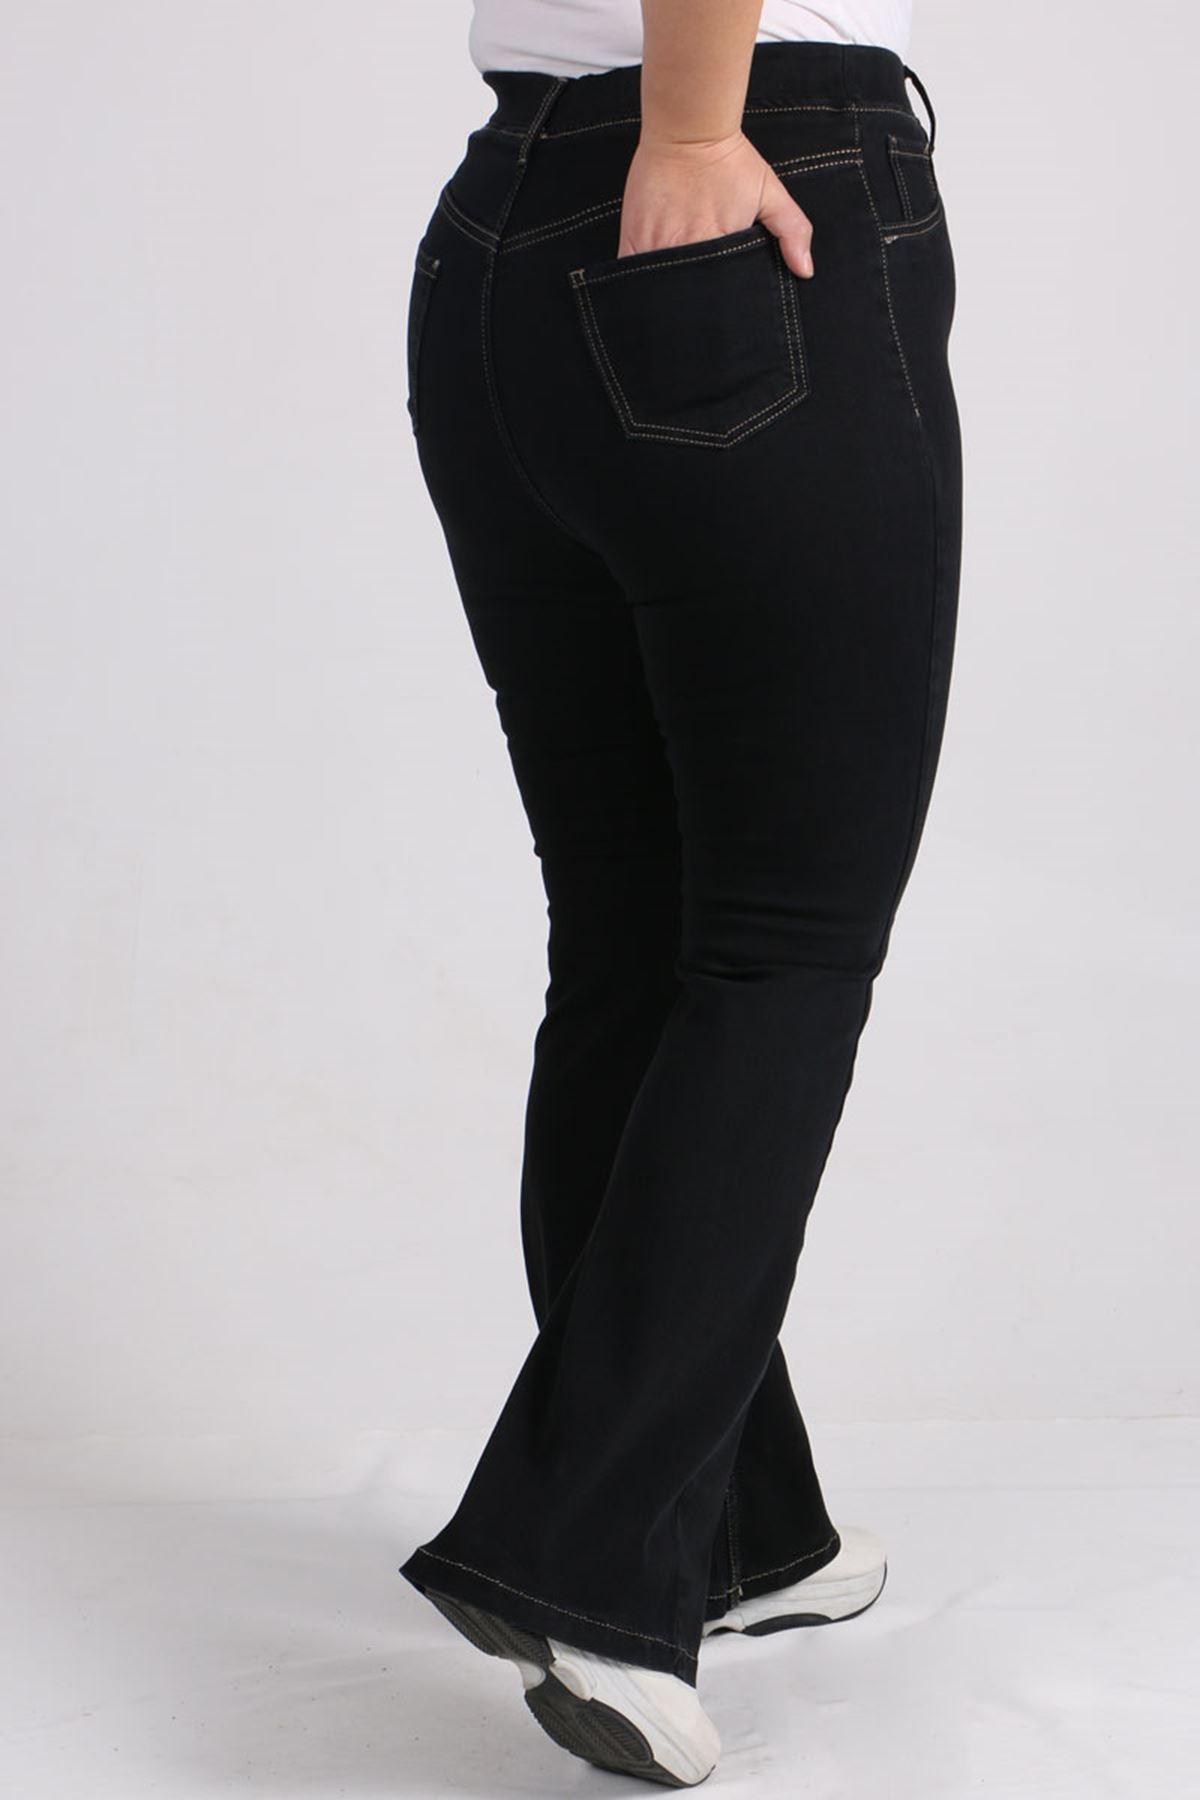 9137 Büyük Beden Beli Lastikli İspanyol Paça Kot Pantalon-Siyah